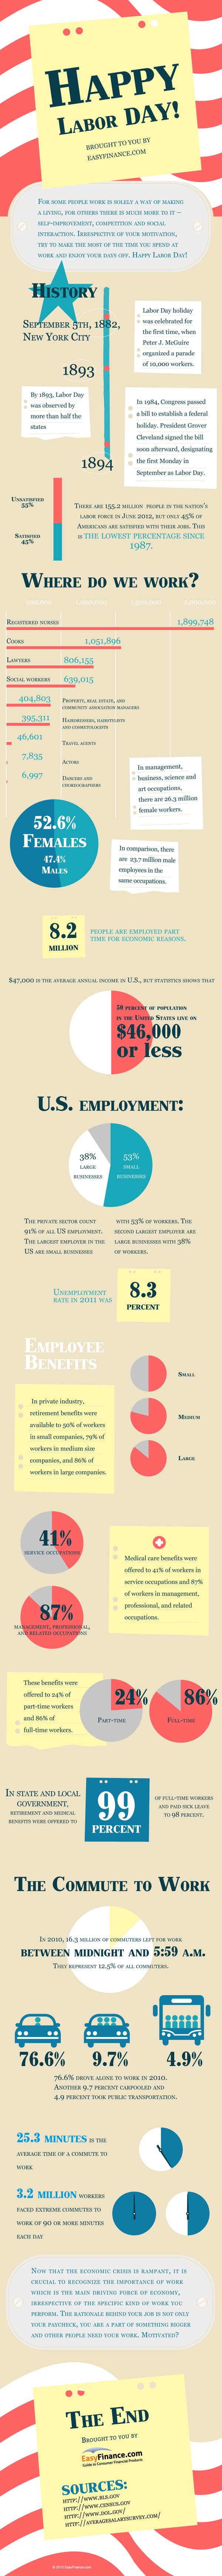 Happy Labor Day! (Infographic)